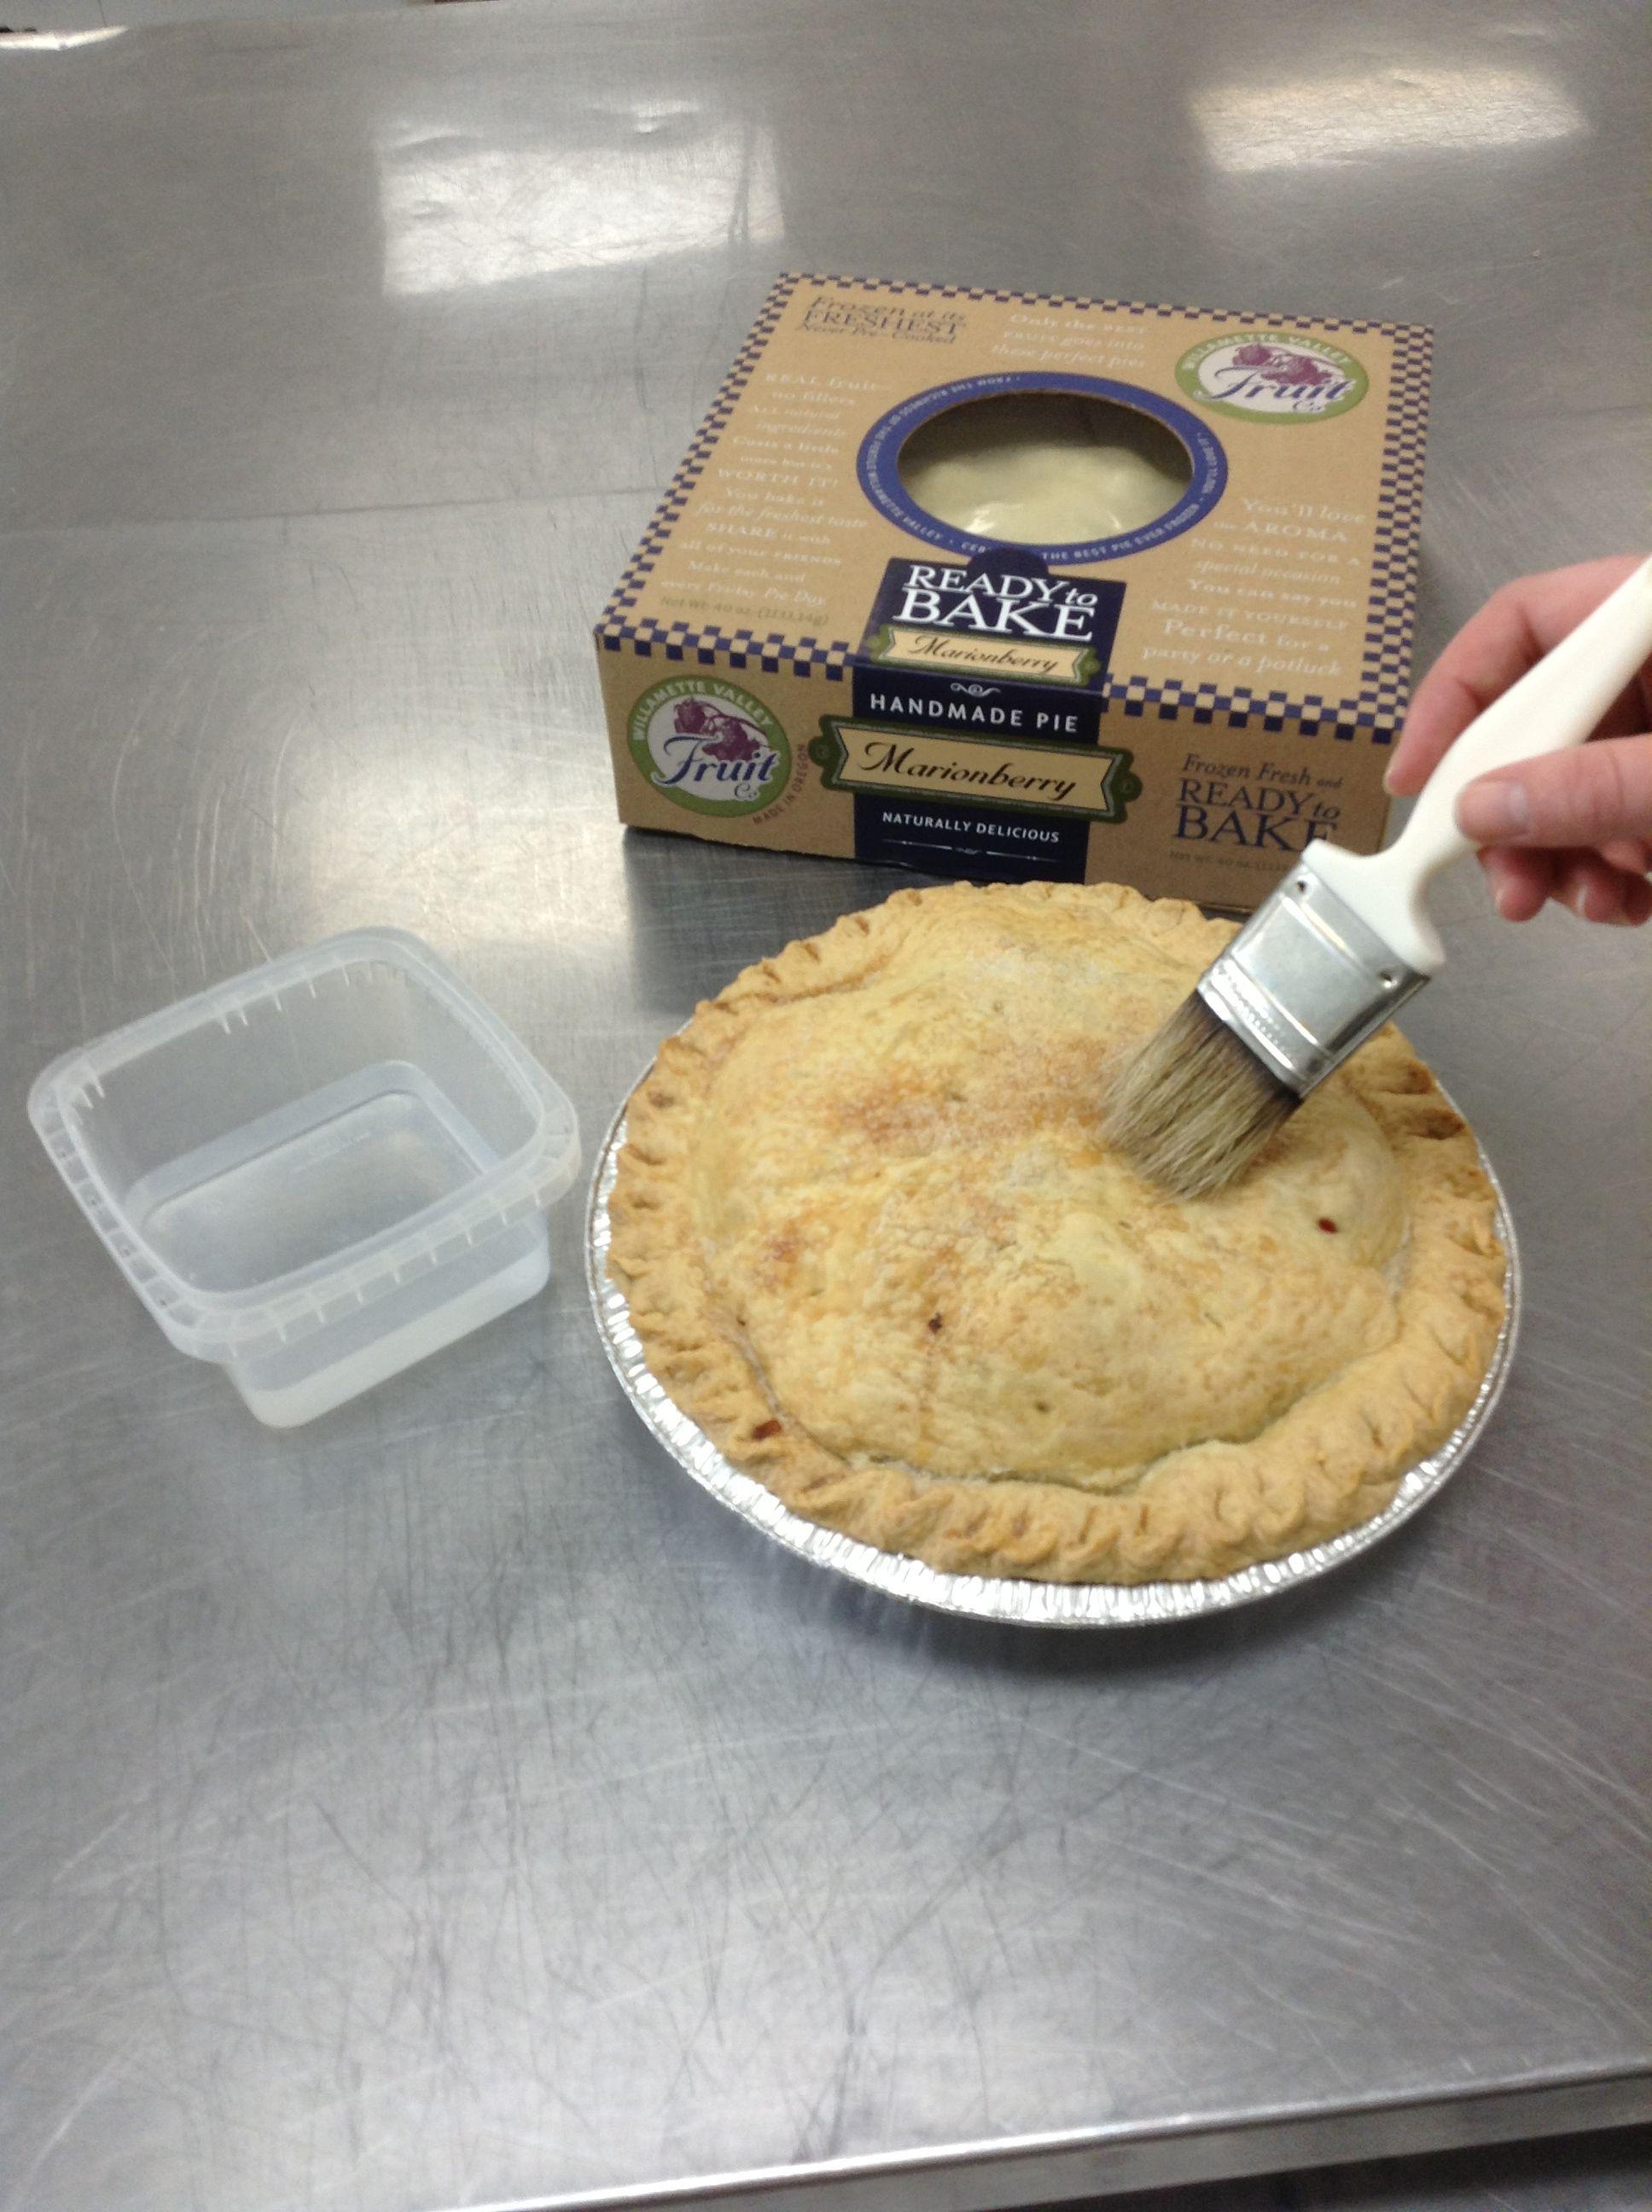 Pin On Pie Baking Tips